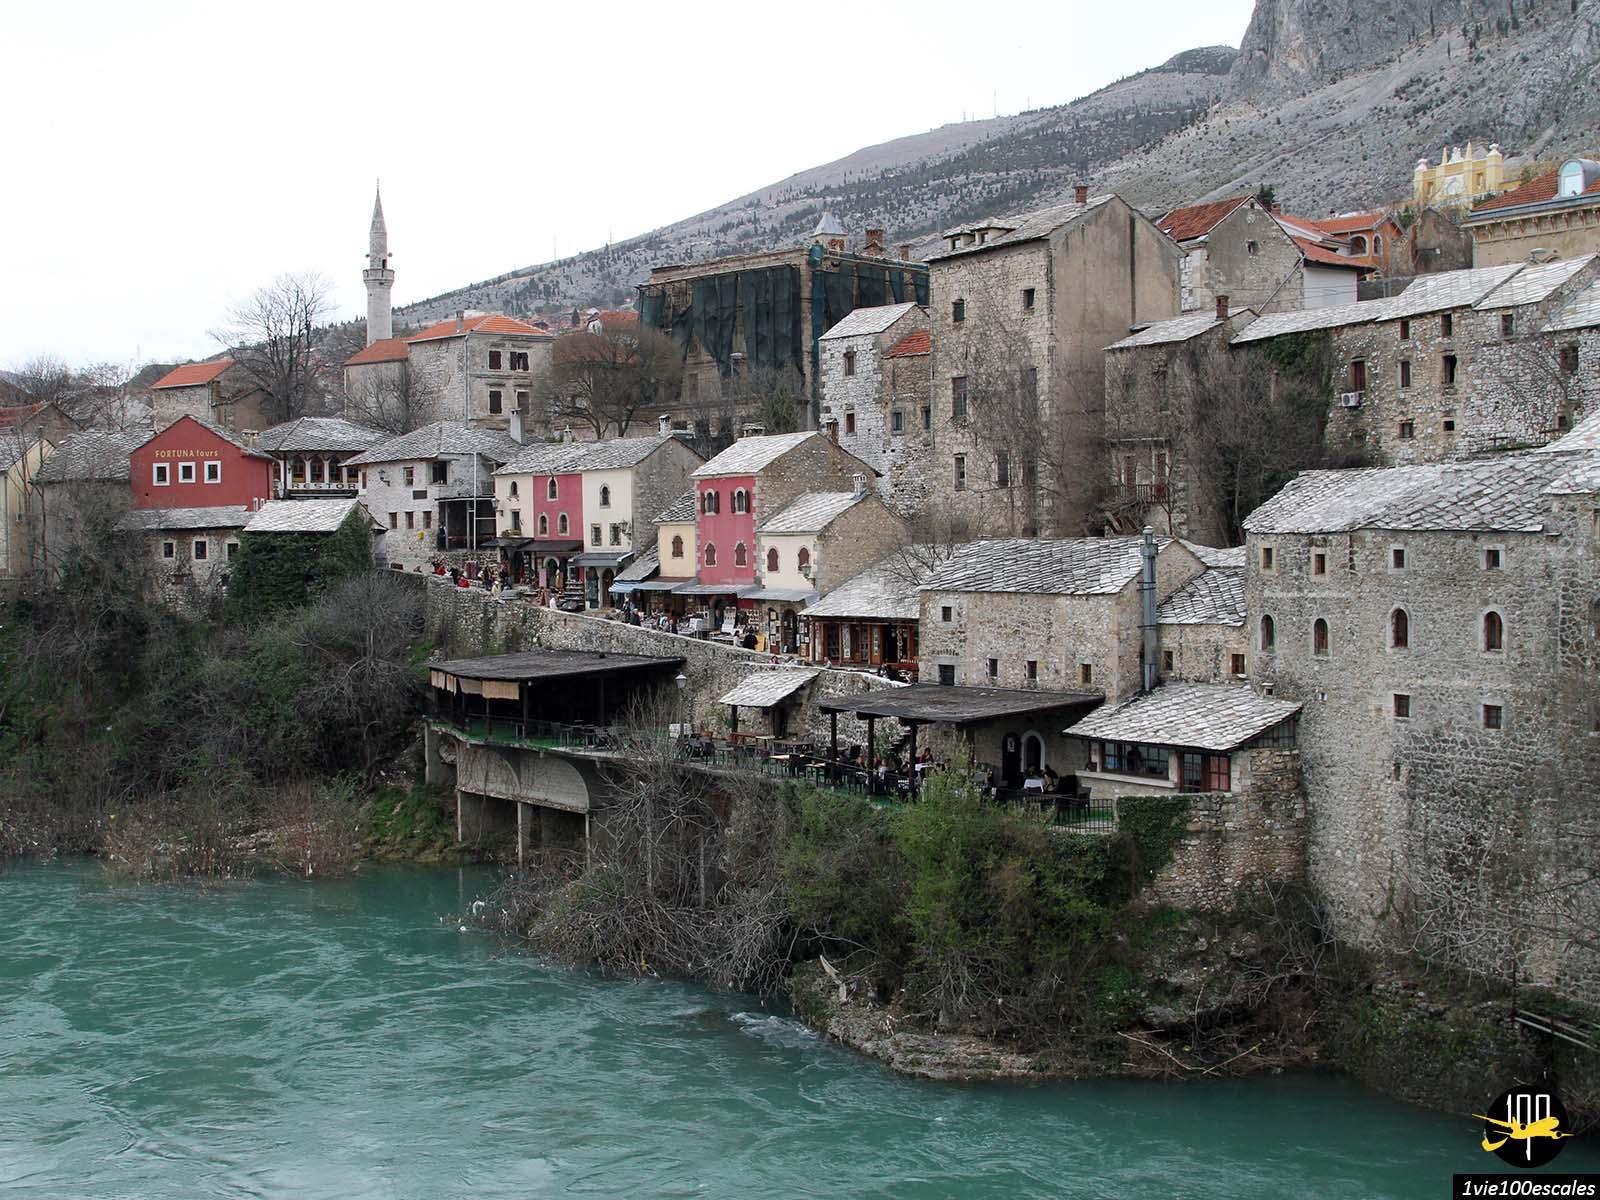 Escale #055 Mostar